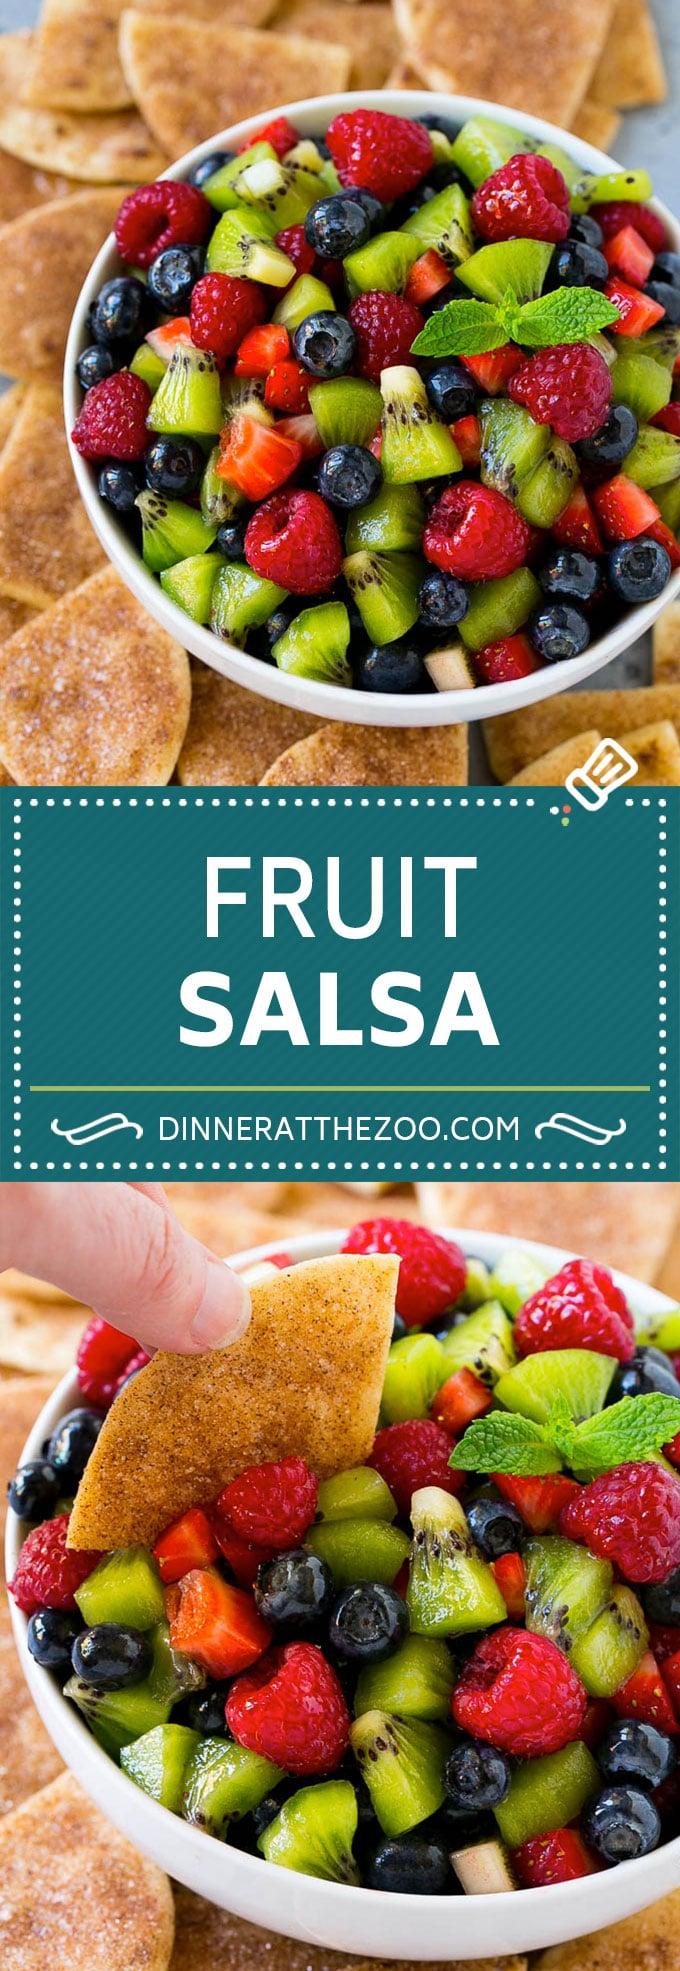 Fruit Salsa Recipe   Dessert Salsa   Cinnamon Sugar Chips   Fruit Recipe #fruit #kiwi #blueberry #strawberry #dip #salsa #dinneratthezoo #dessert #snack